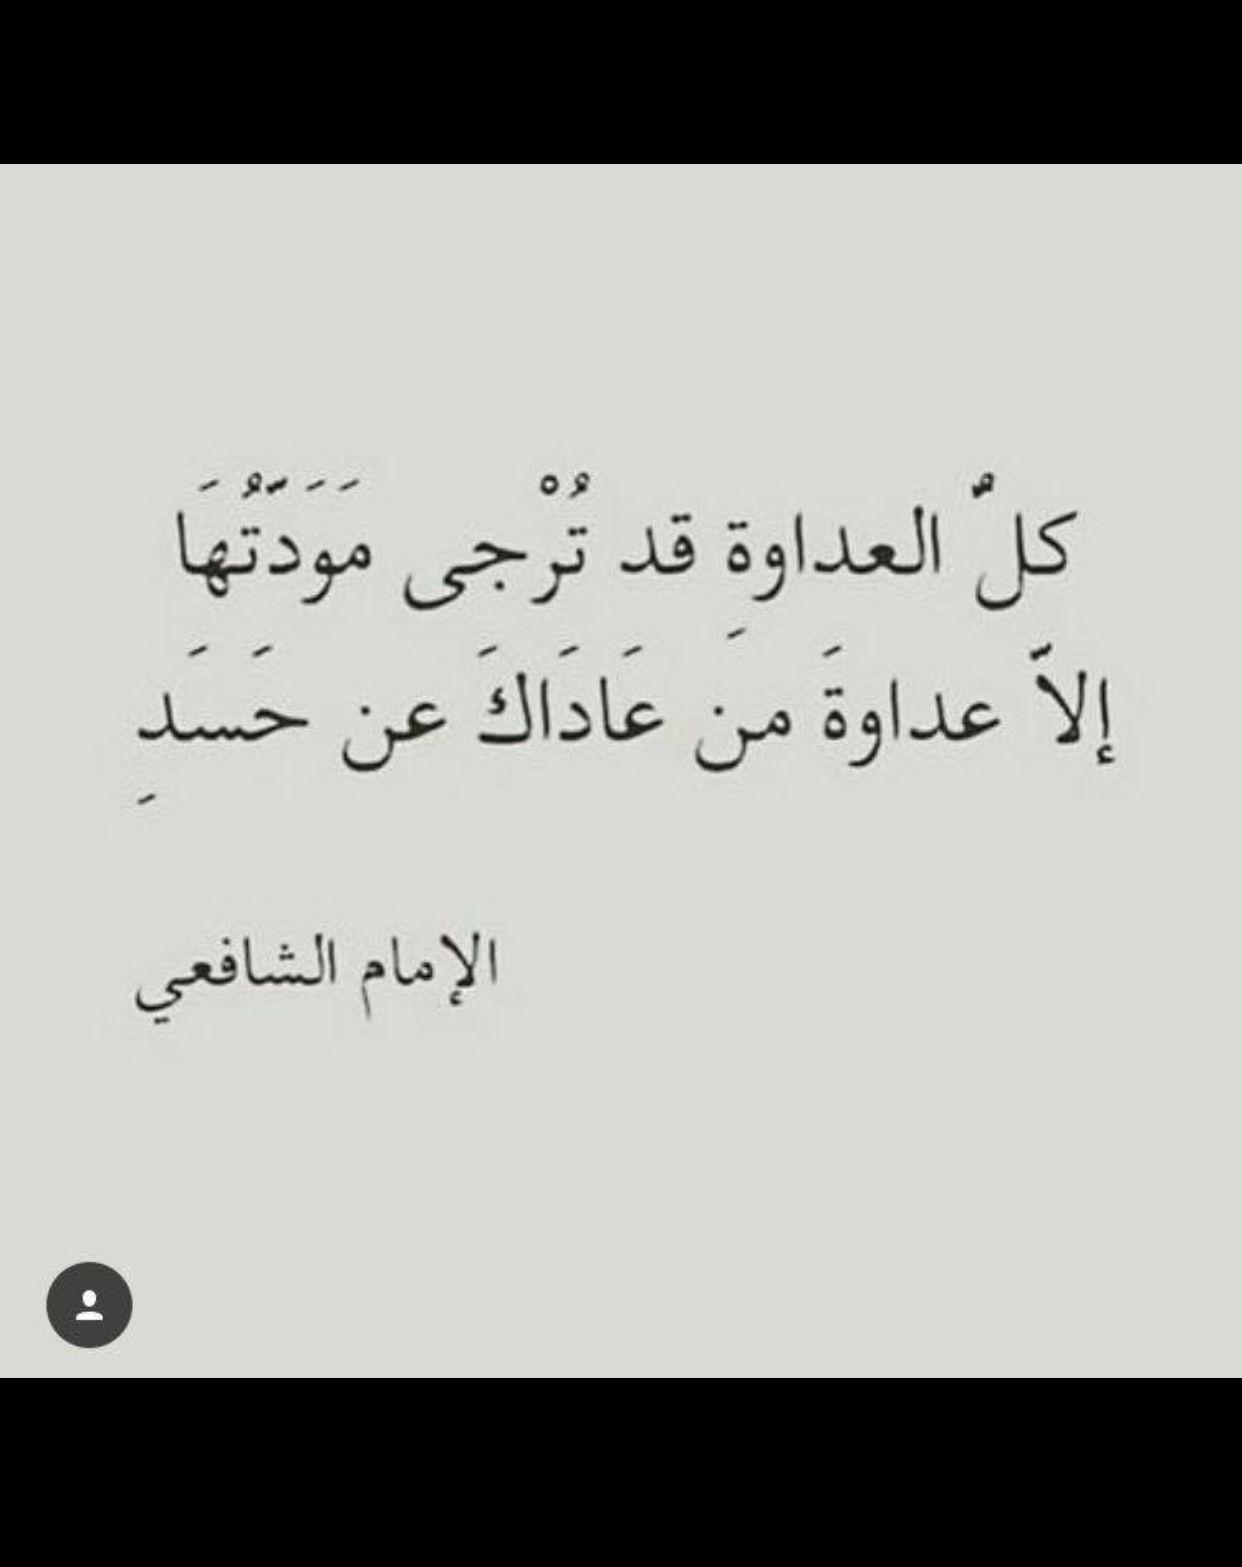 Pin By ث ہو ڑ ۃ ے On من روائع الشعر العربي Arabic Calligraphy Calligraphy